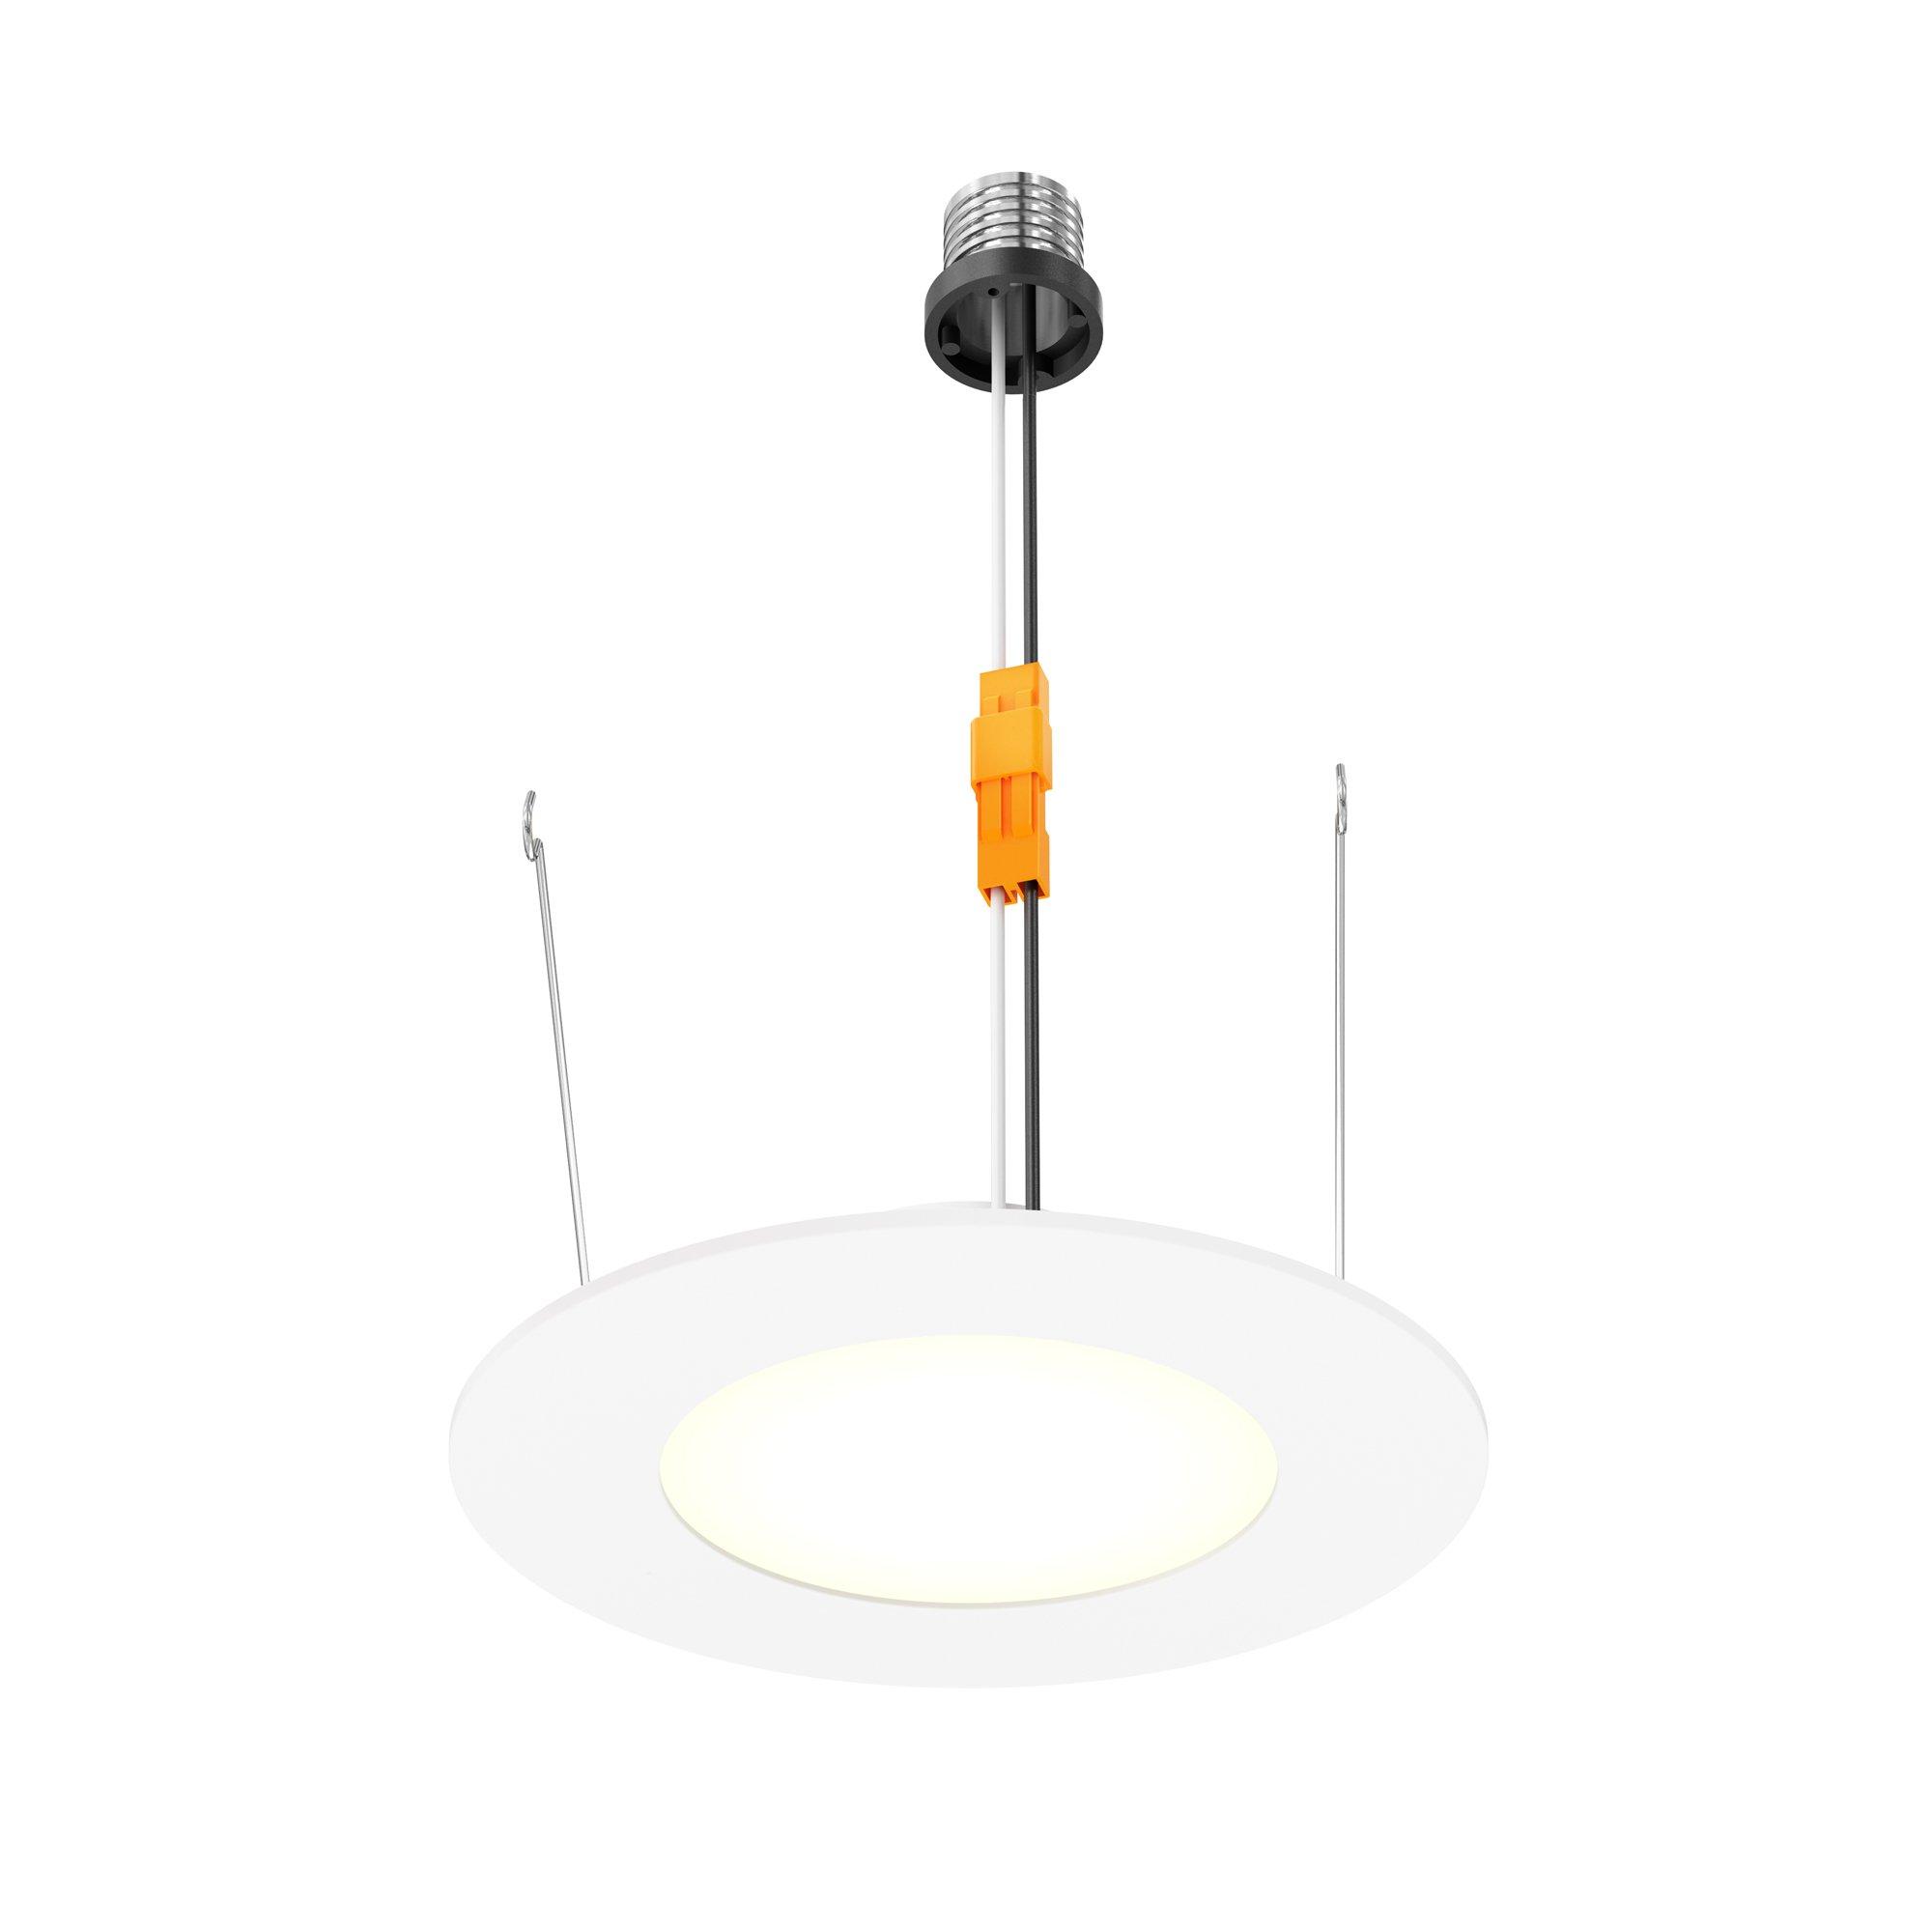 DALS Lighting LEDPNLRTF56-WH 6'' Round Retrofit LED Recess Panel, White